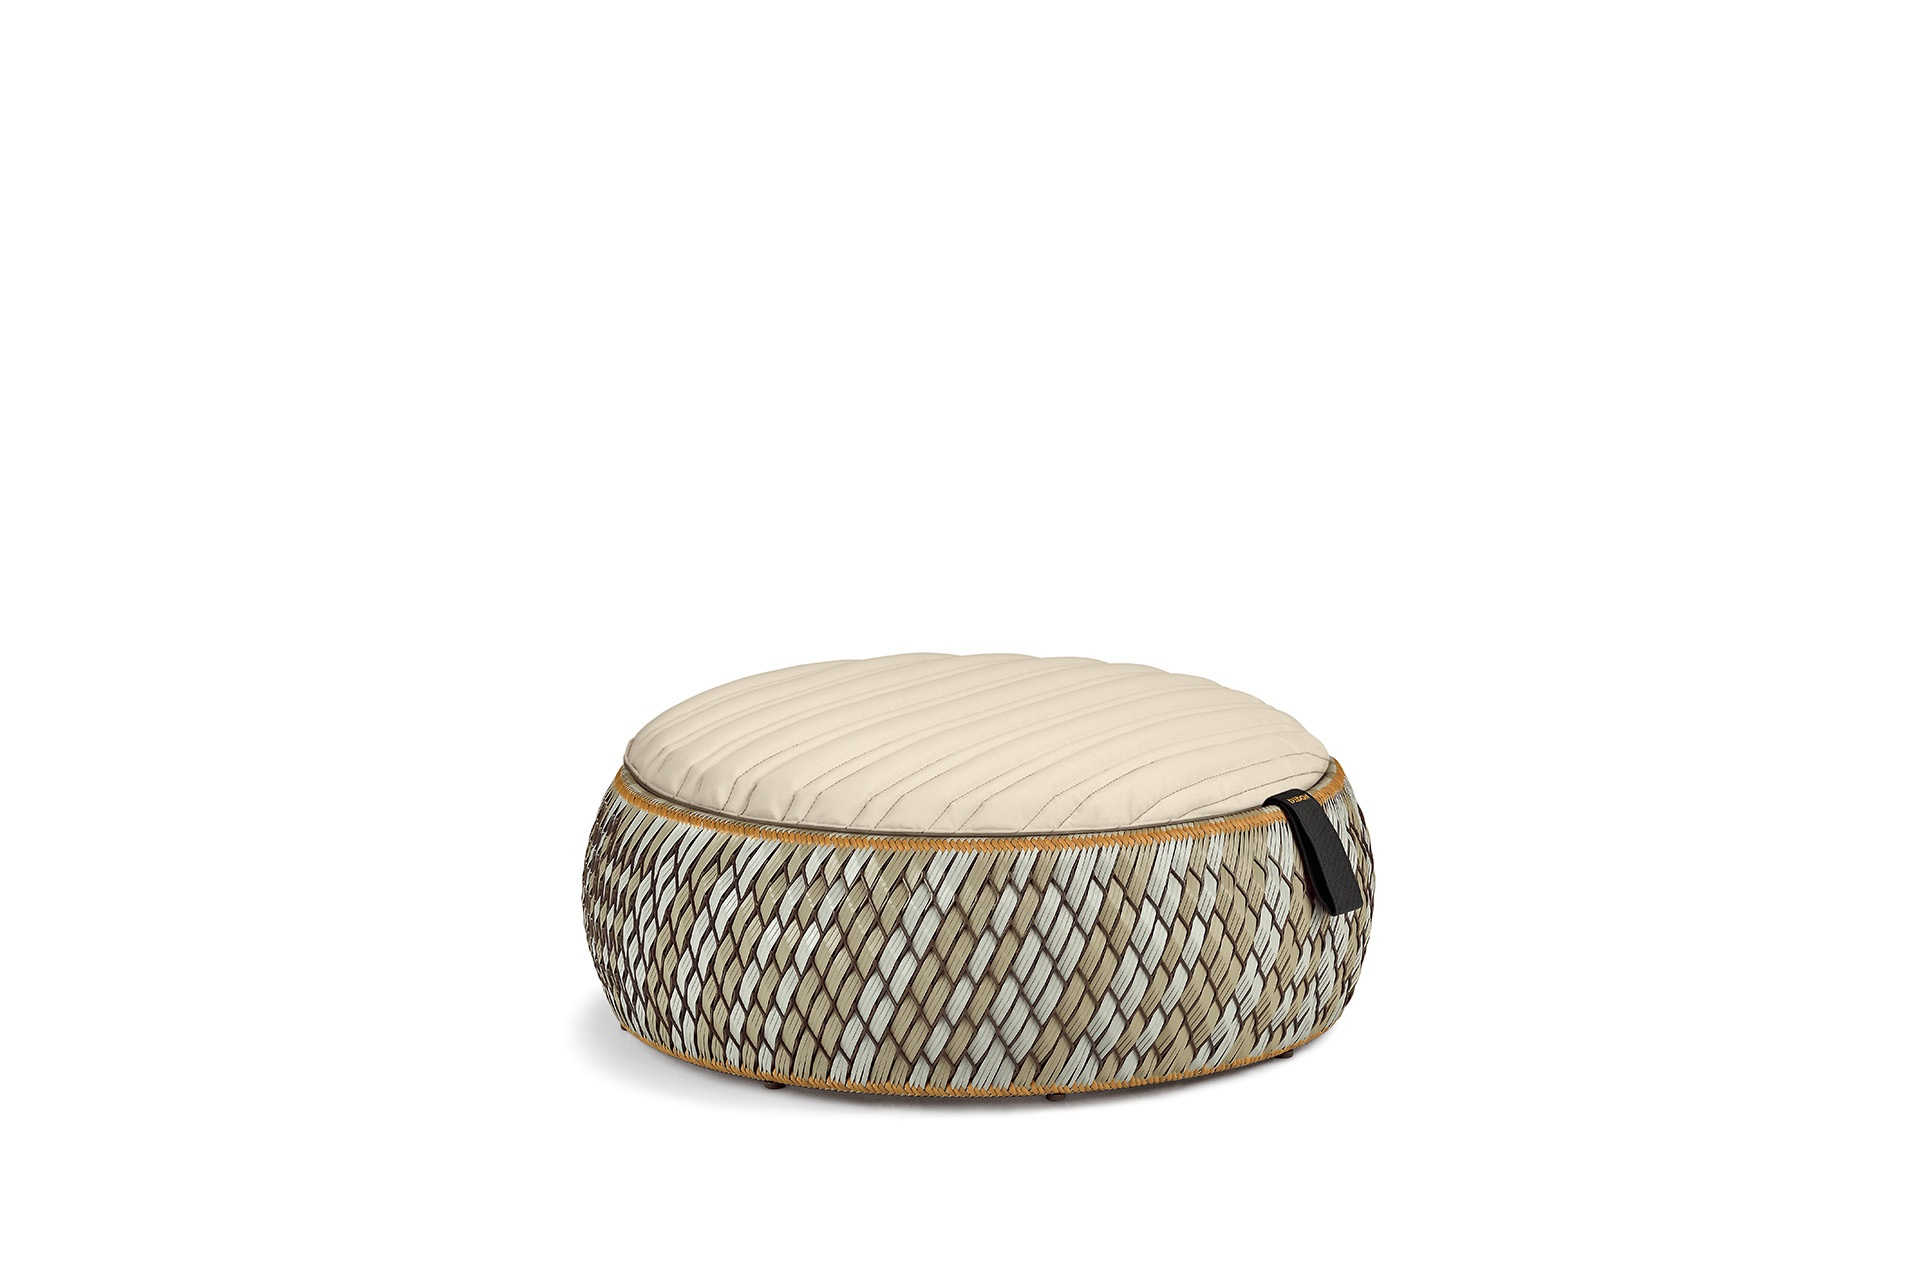 f e hochlegen mit dem hocker dala base von dedon. Black Bedroom Furniture Sets. Home Design Ideas